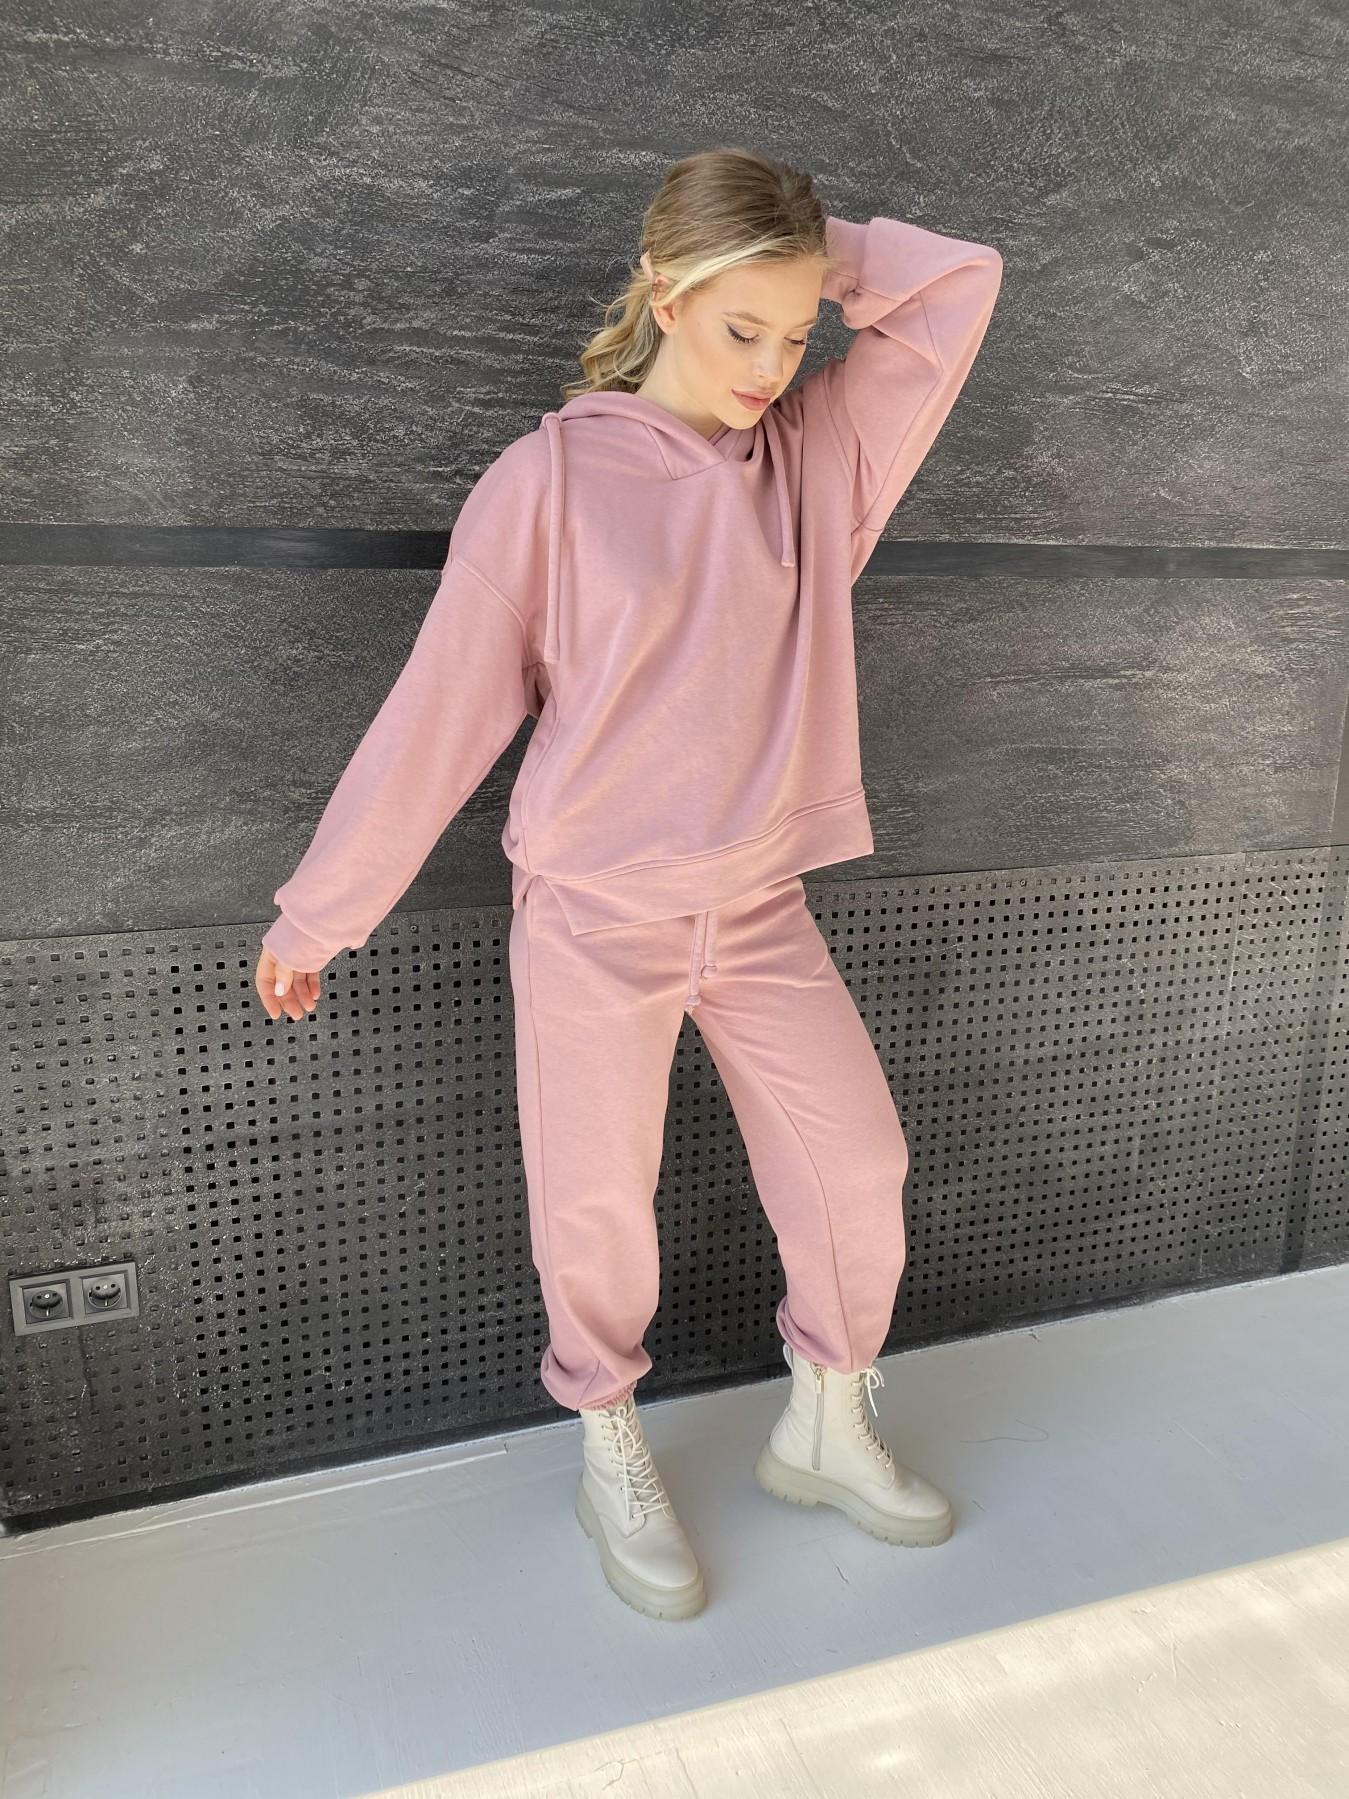 Ярис костюм из 3х нитки 10789 АРТ. 47262 Цвет: Пудра - фото 8, интернет магазин tm-modus.ru